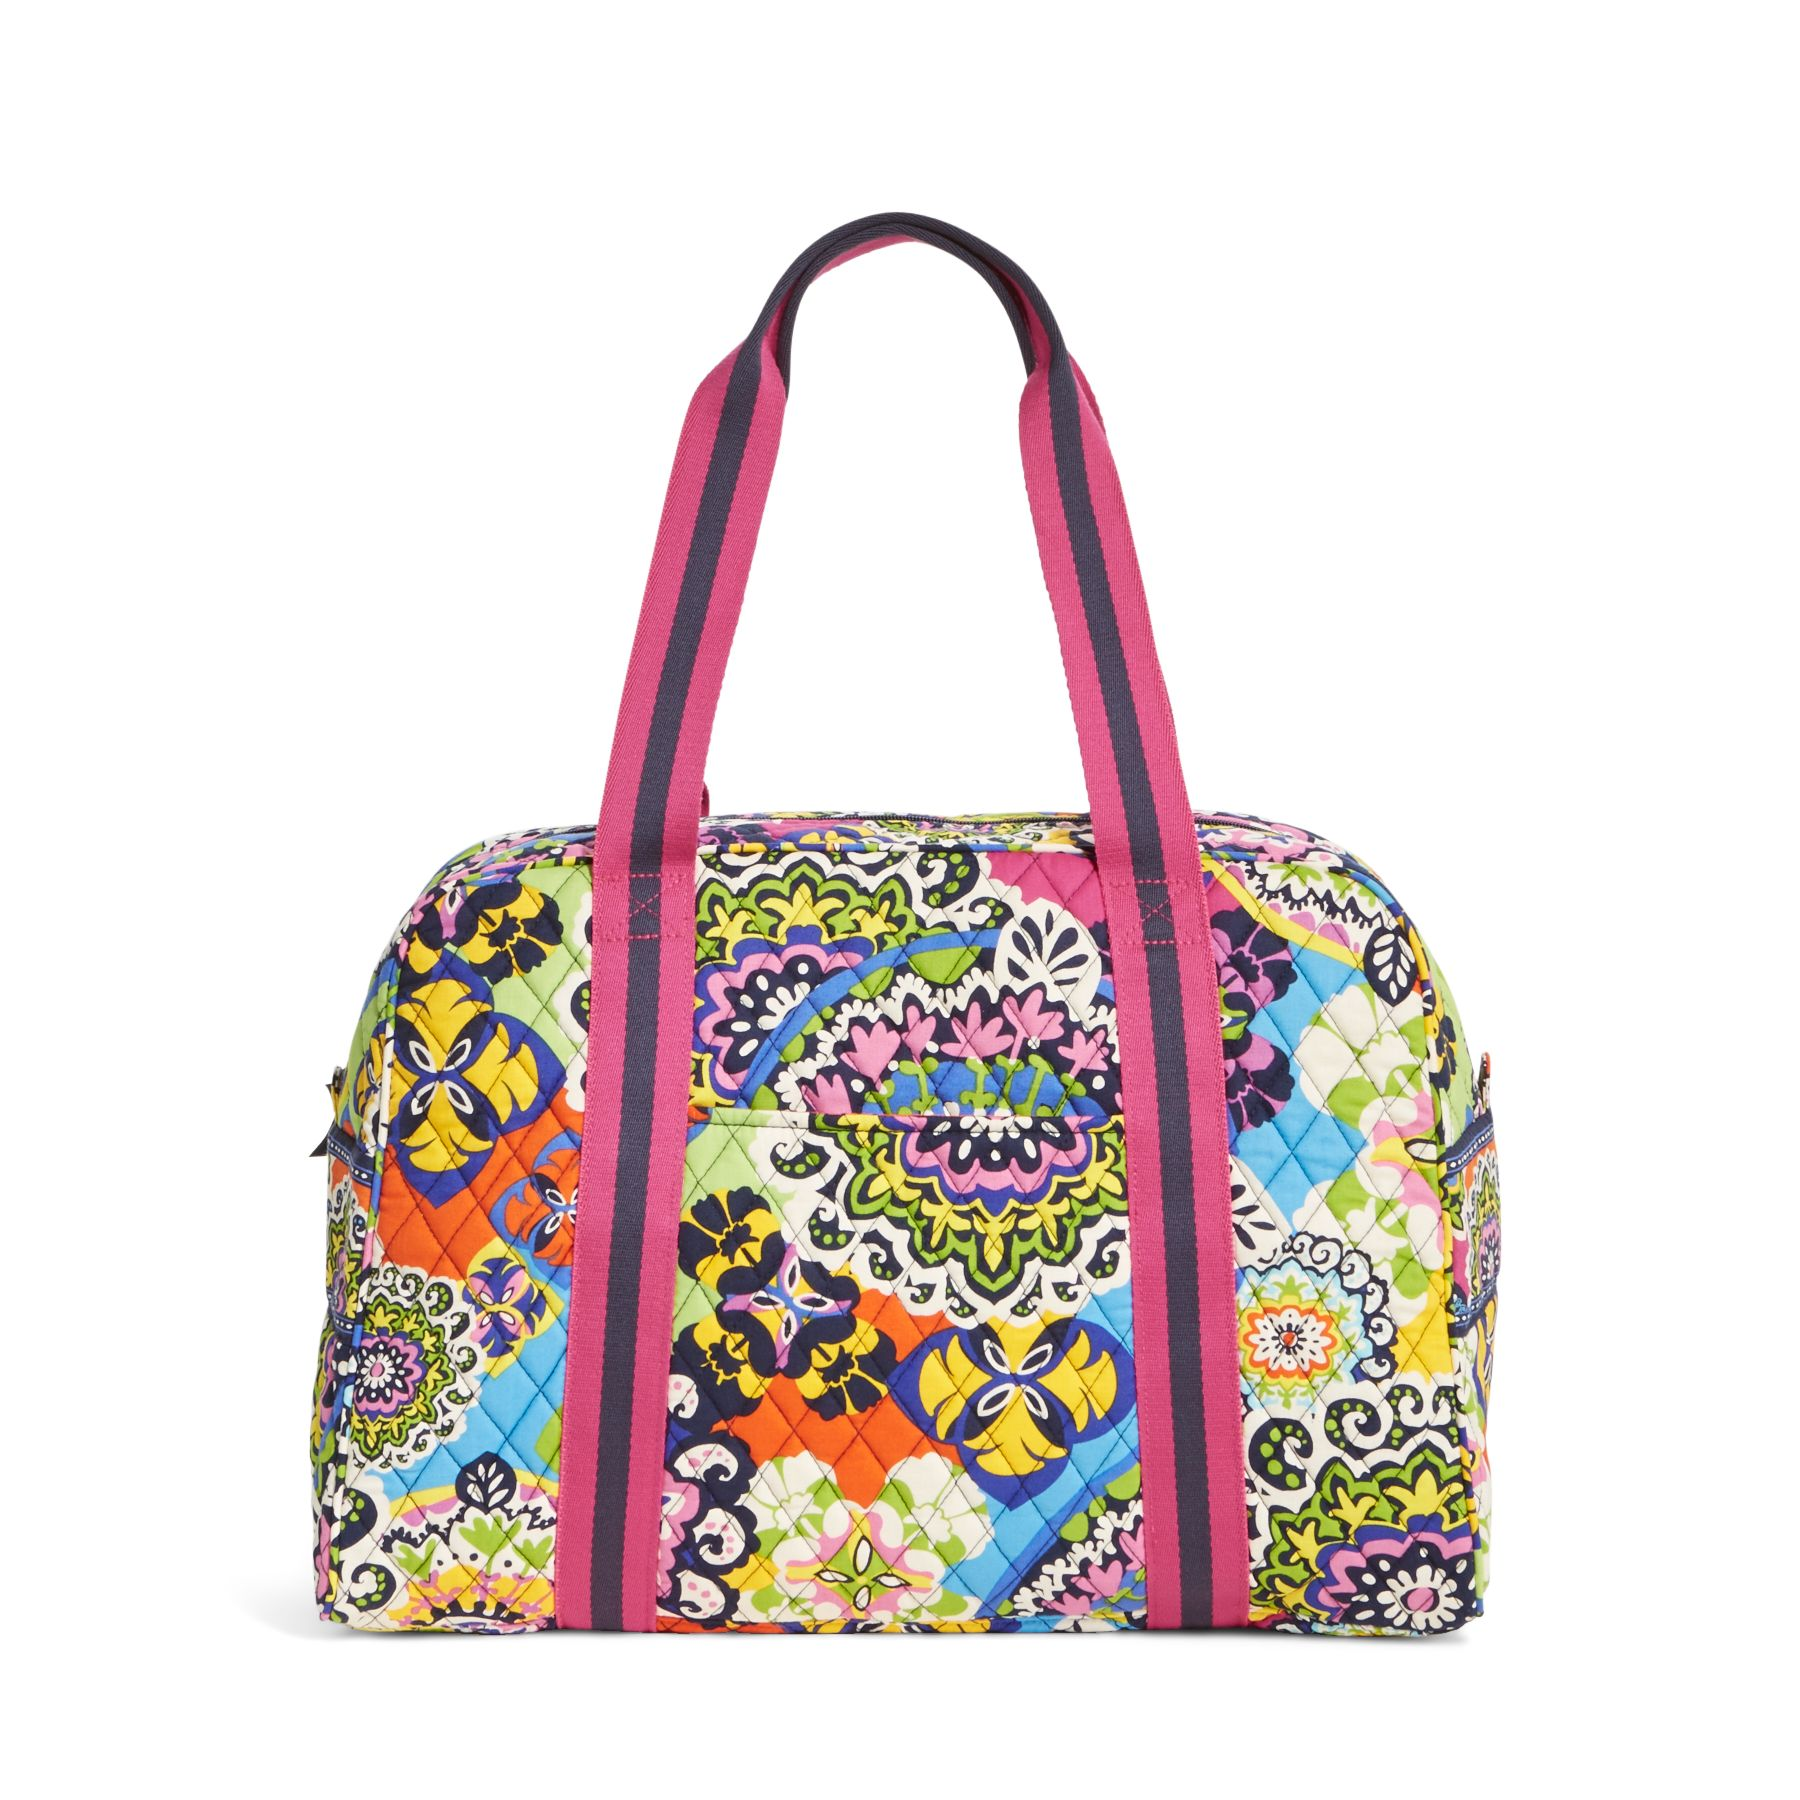 Gym Bag Vera Bradley: Vera Bradley Sport Duffel Travel Bag